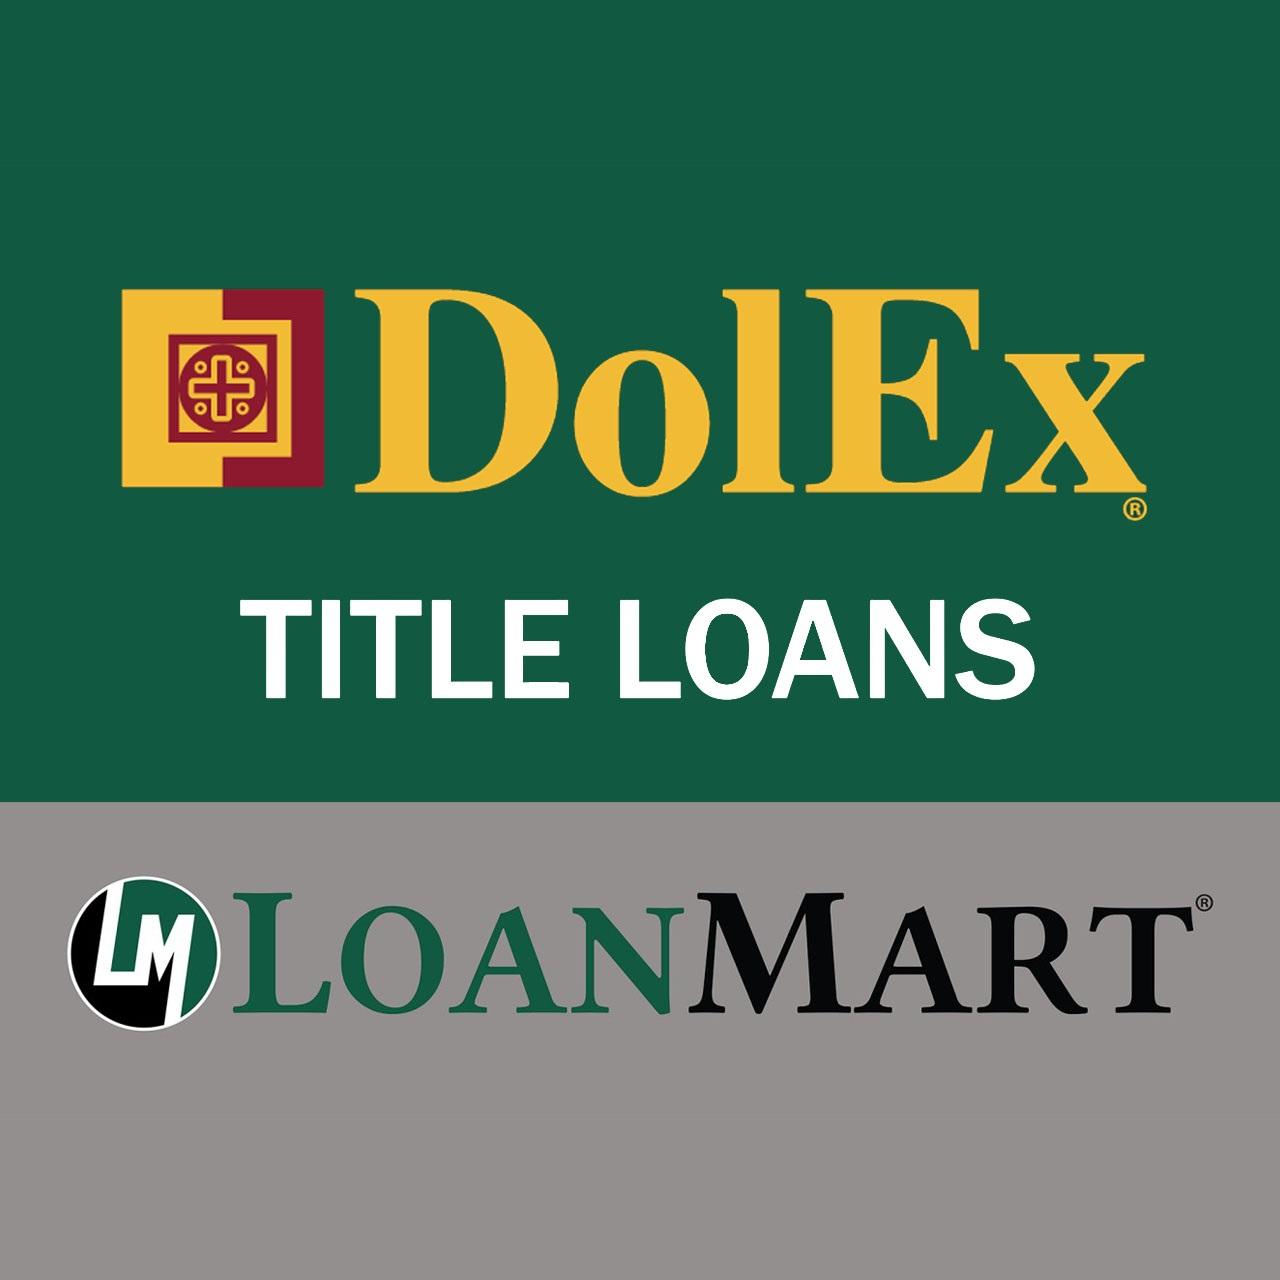 DolEx® Title Loans - LoanMart Panorama City